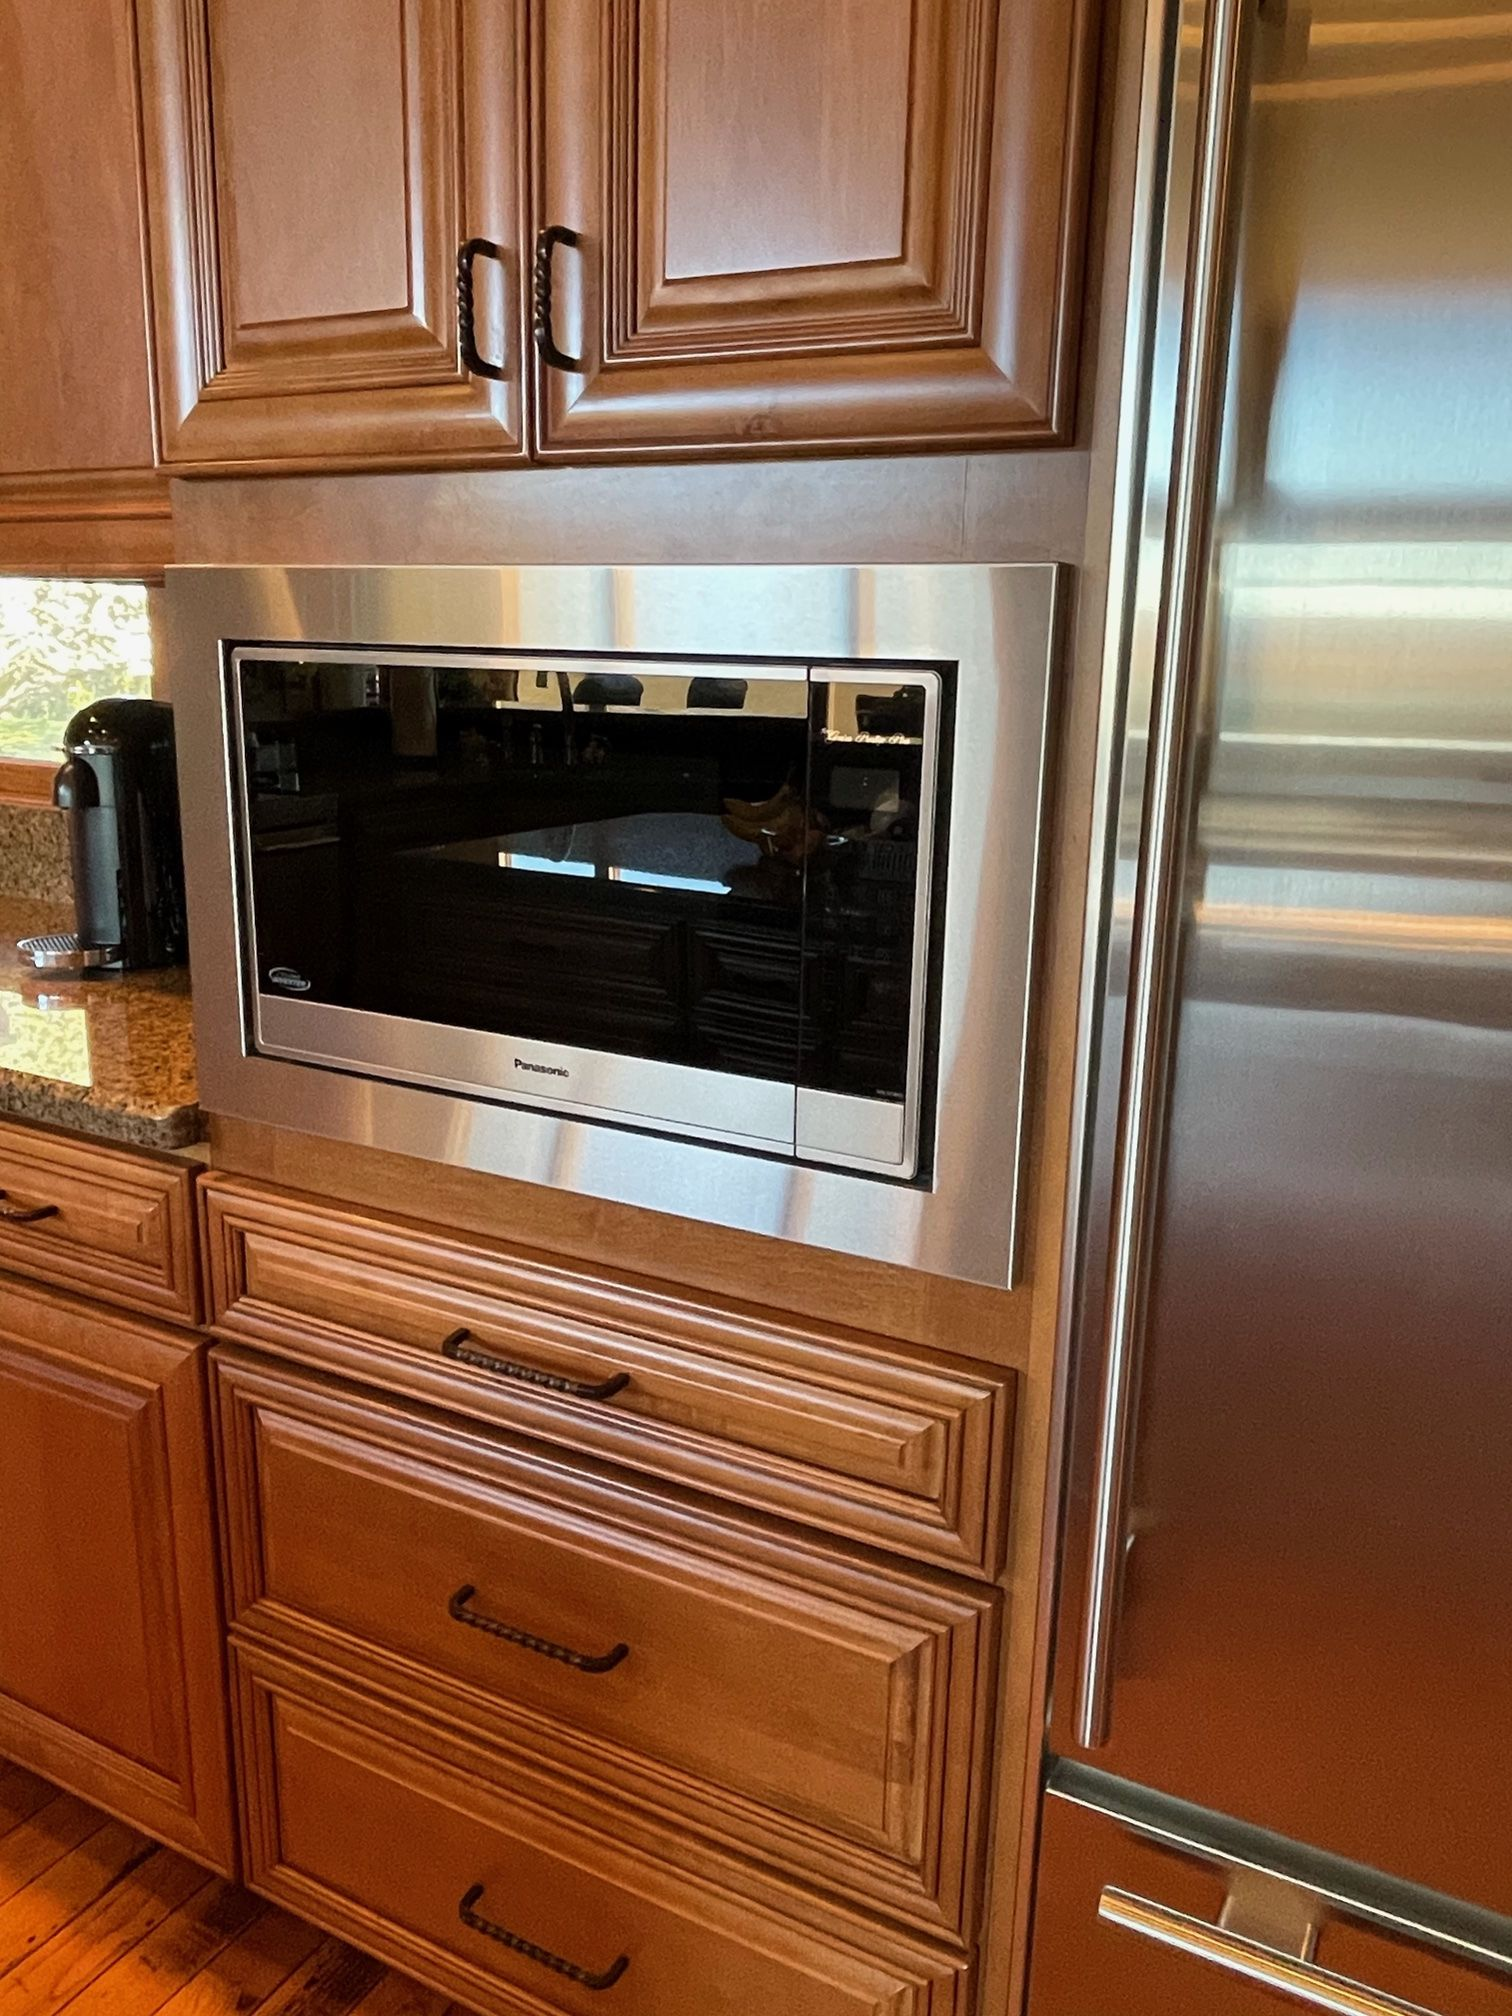 trimkits usa microwave oven trim kits